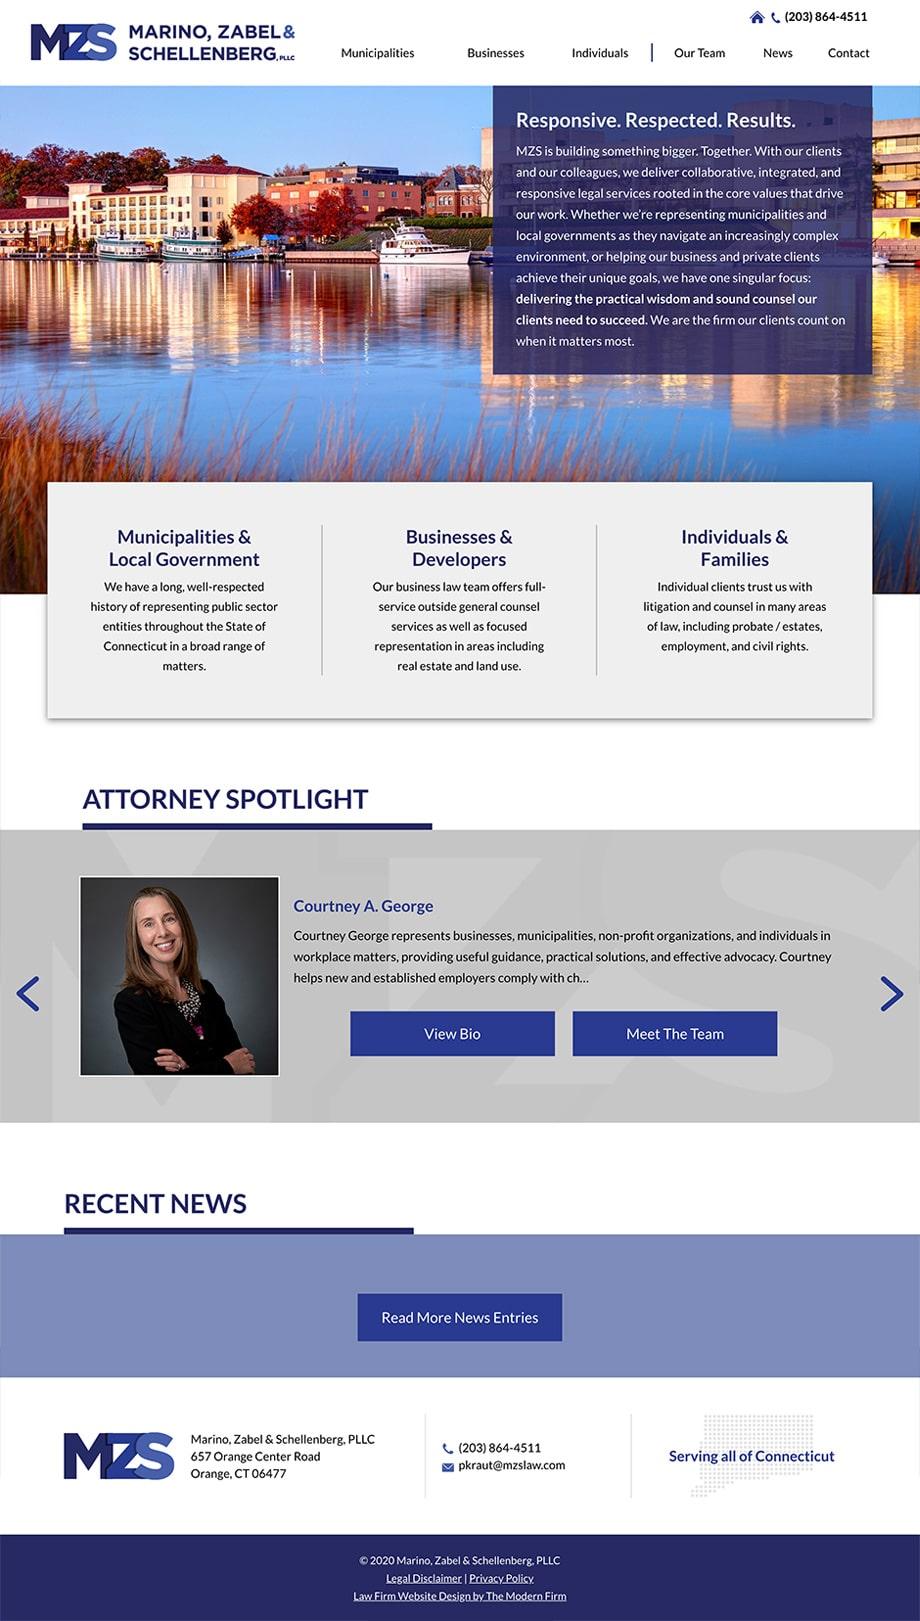 Law Firm Website Design for Marino, Zabel & Schellenberg, PLLC